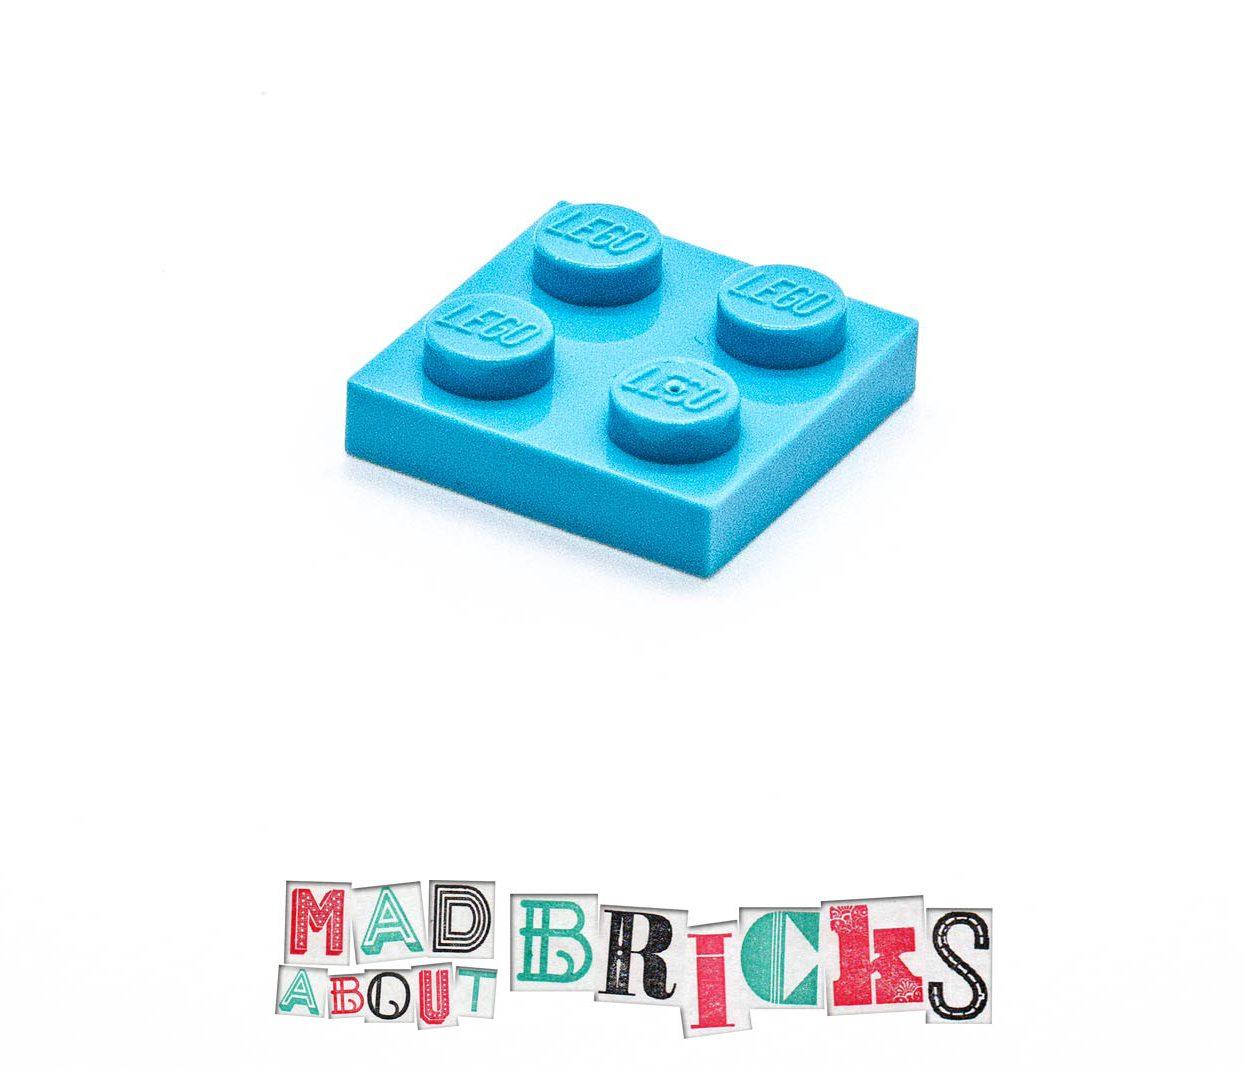 Lego 4585677 3022 1x Maersk Blue 2x2 Plate Top